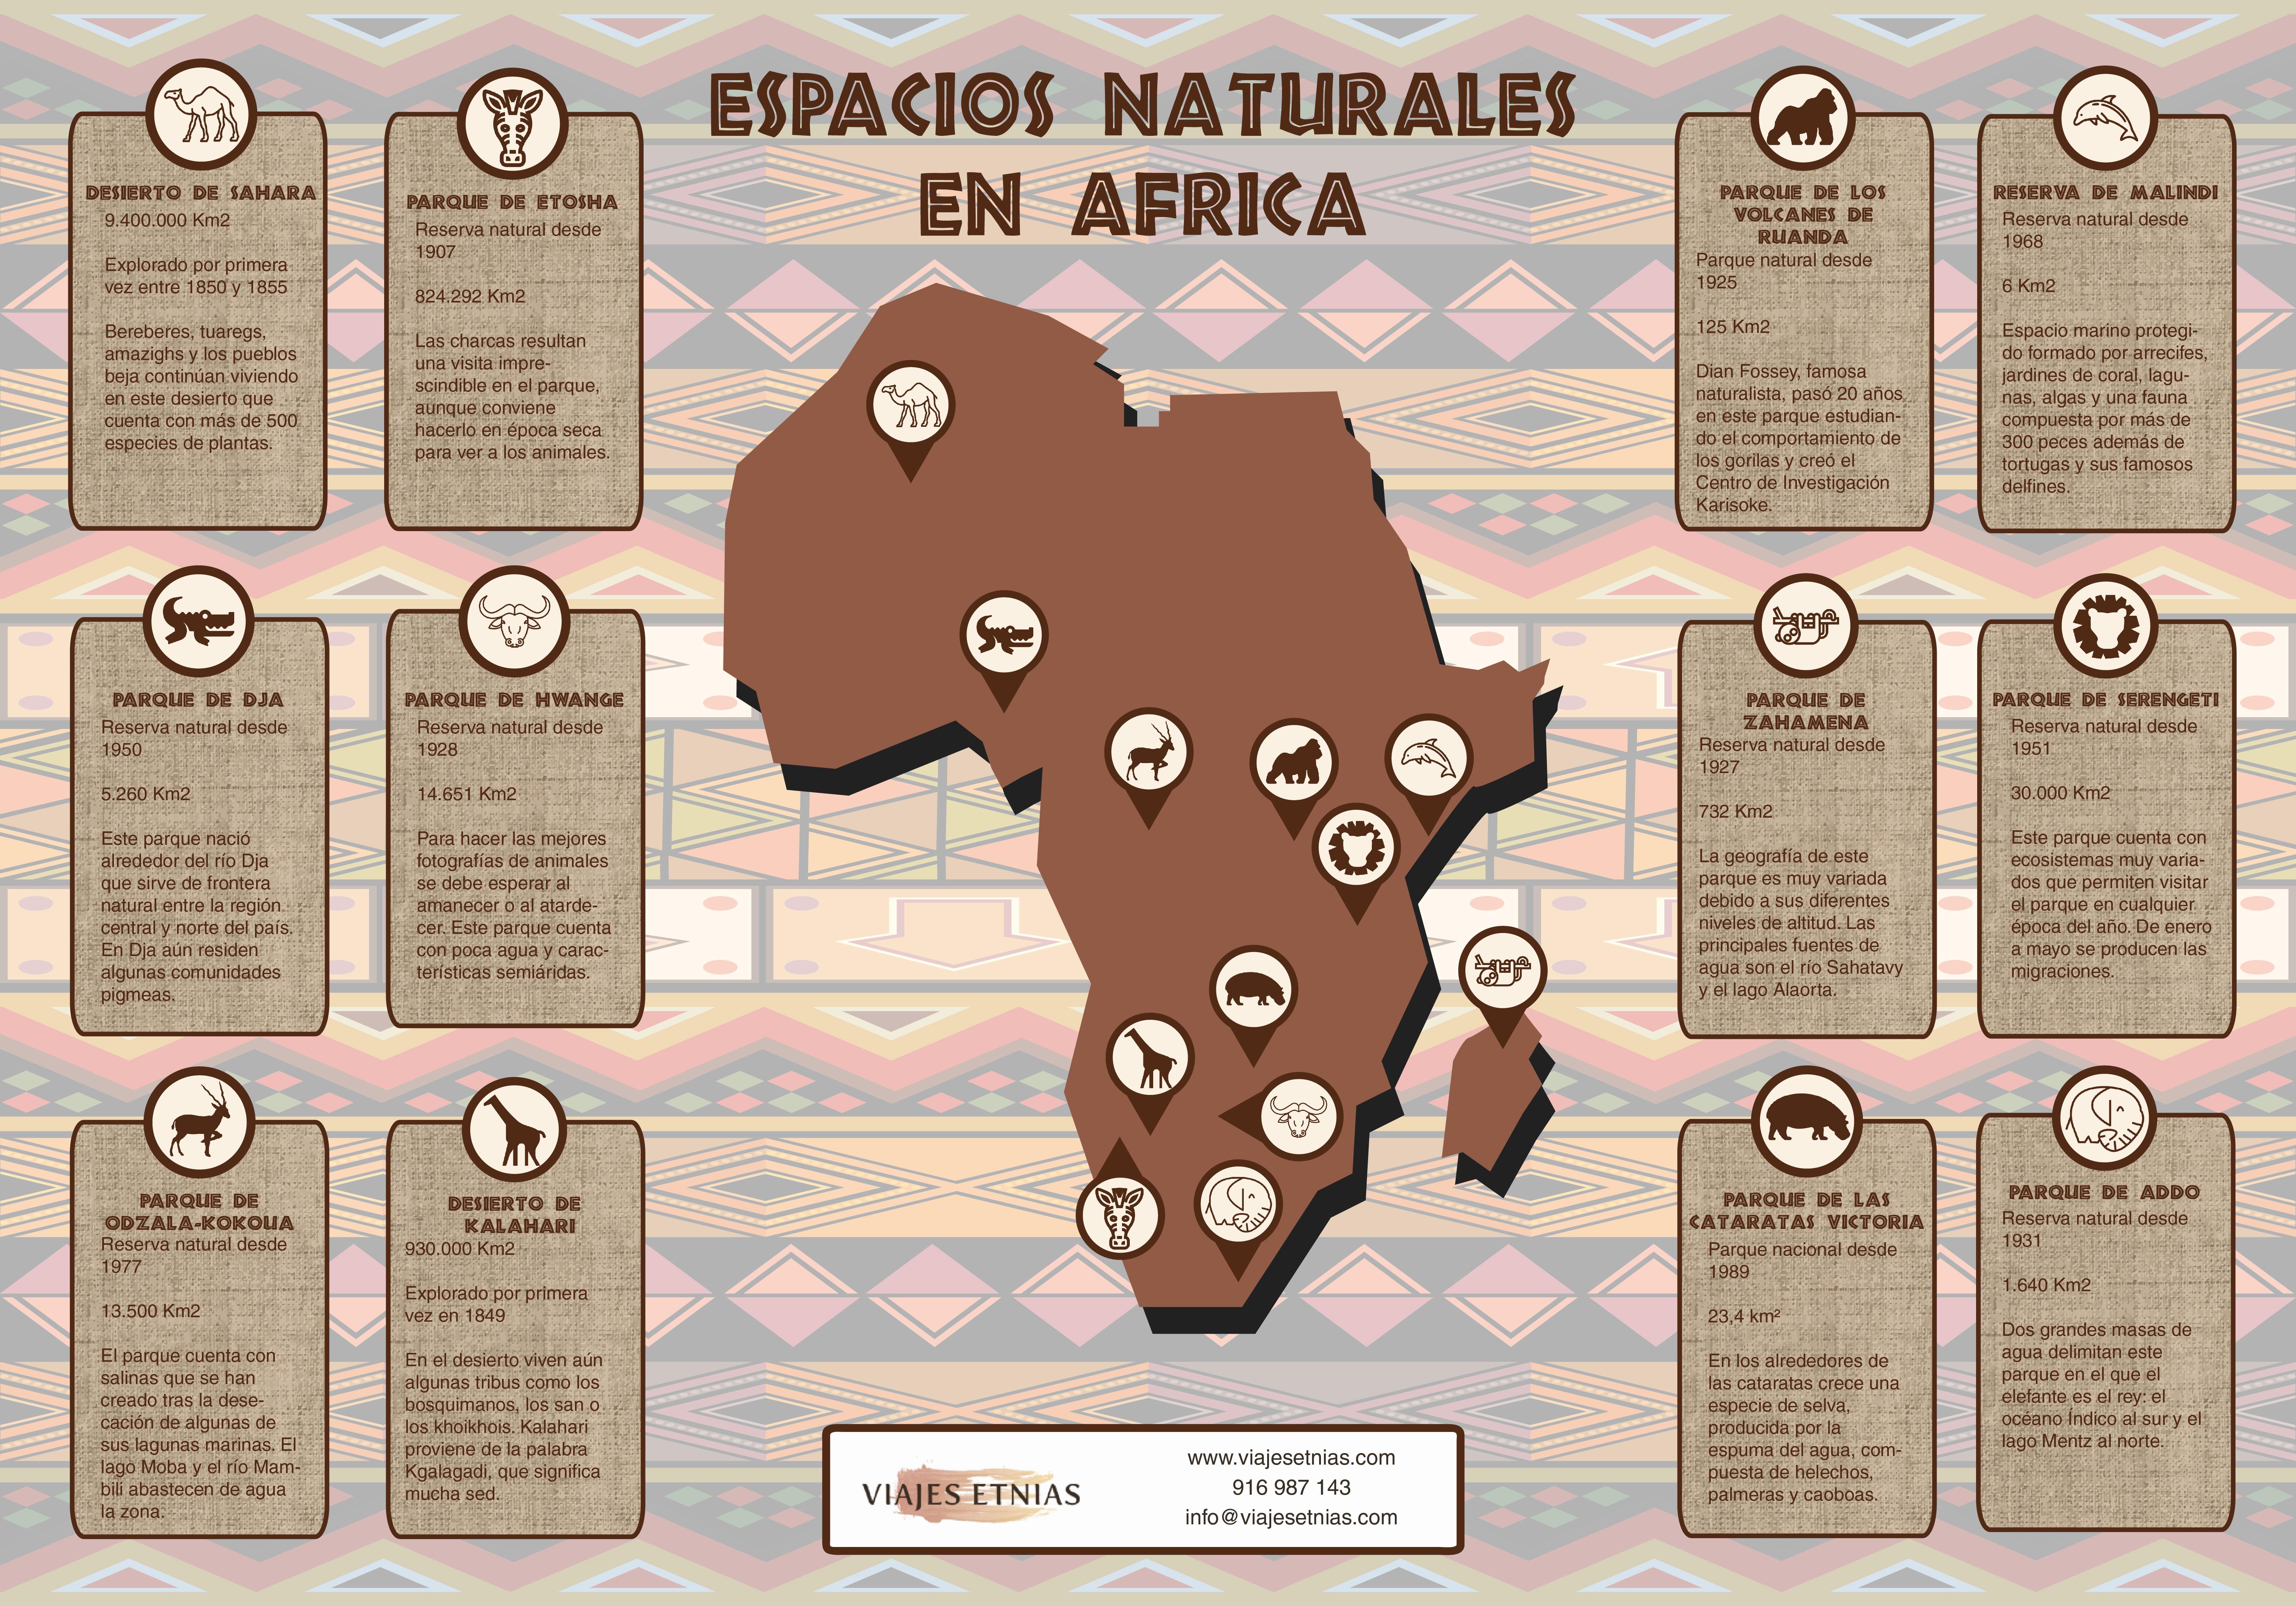 Infografia de los espacios naturales de África